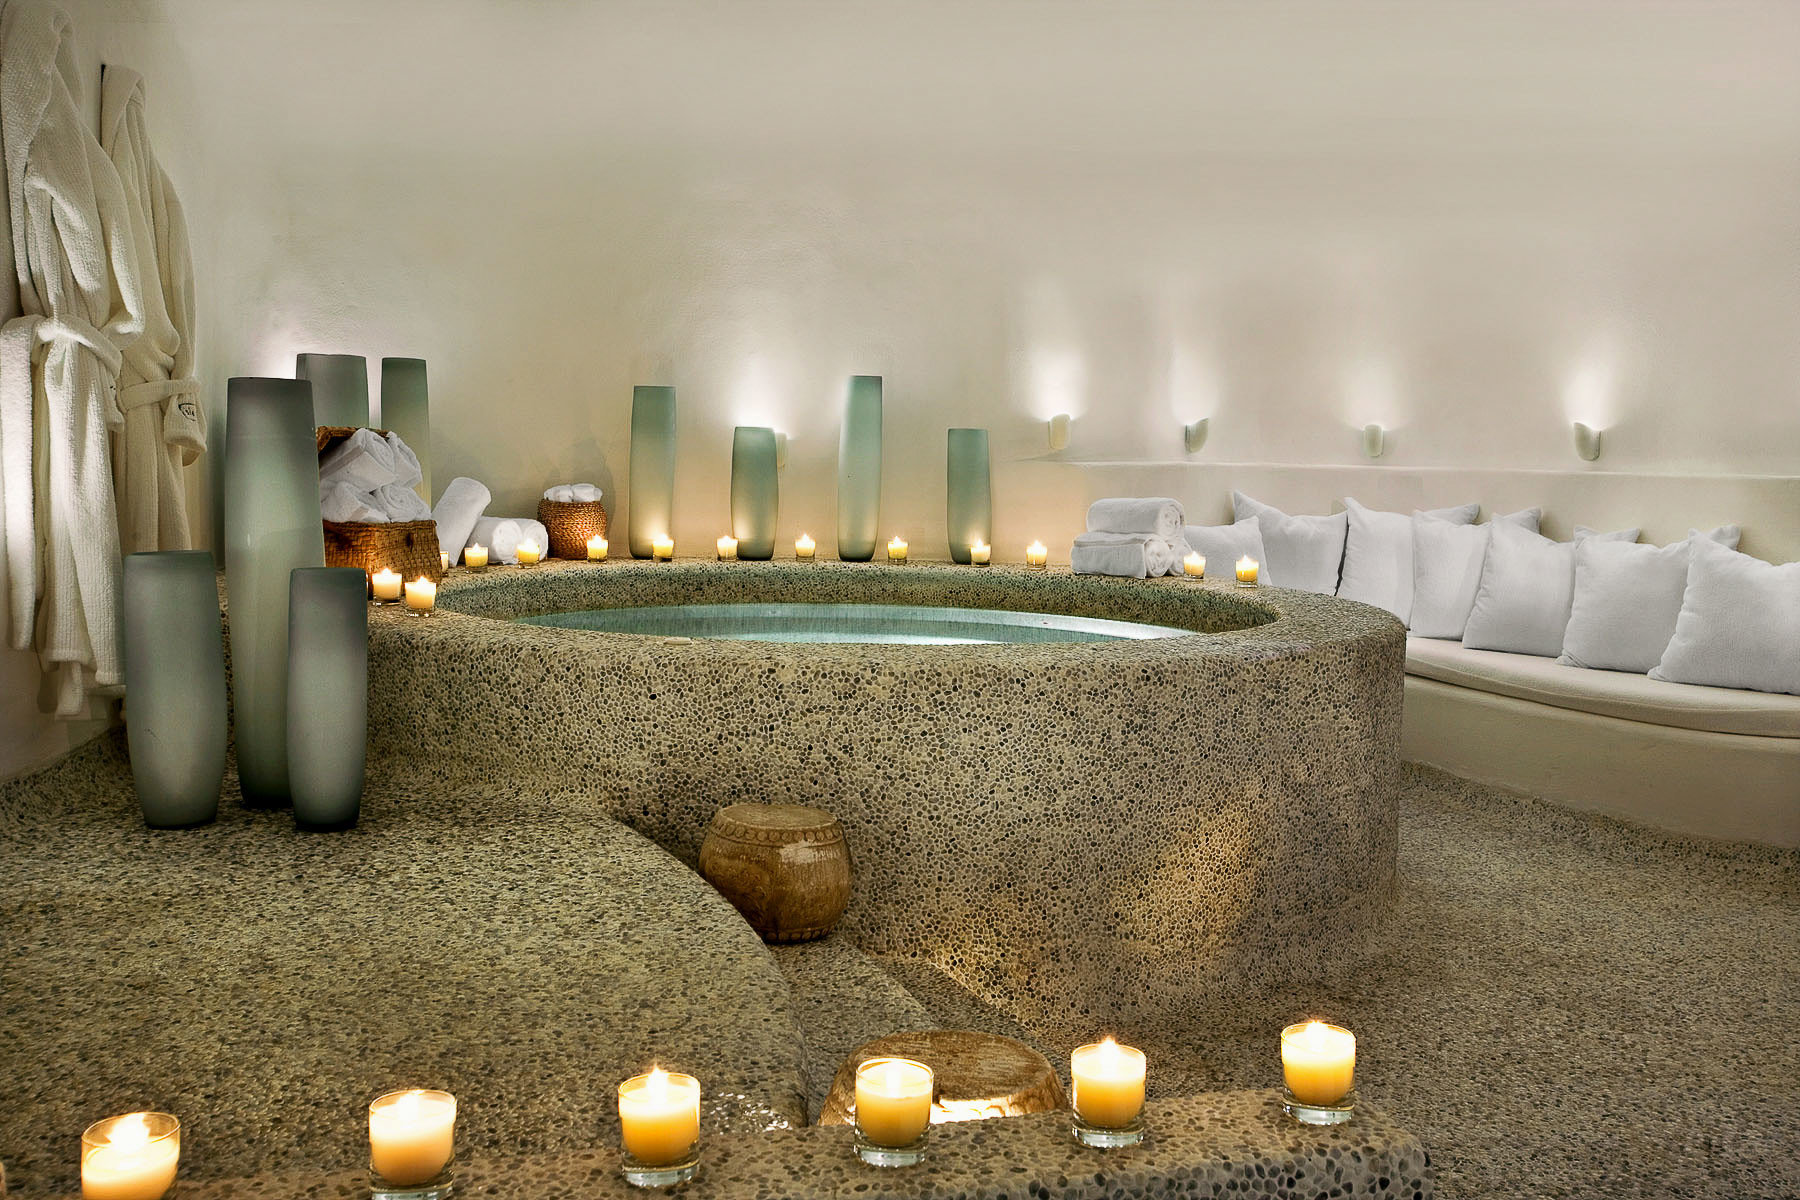 Hot tub/Jacuzzi Lounge Romantic Spa lighting Lobby counter living room function hall ballroom